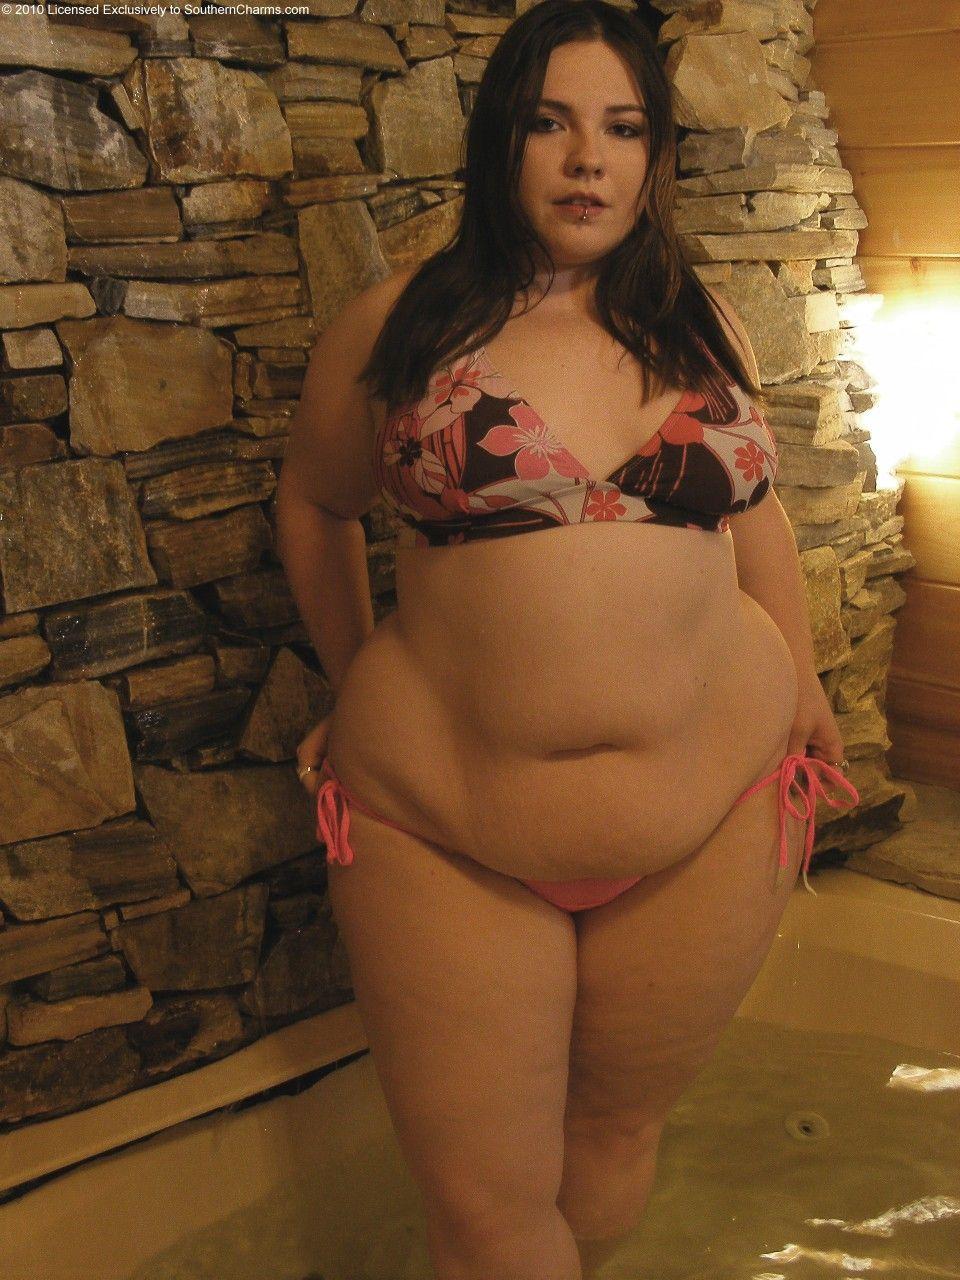 Fat Bikini Girls Bbw Candid Porn Gifs